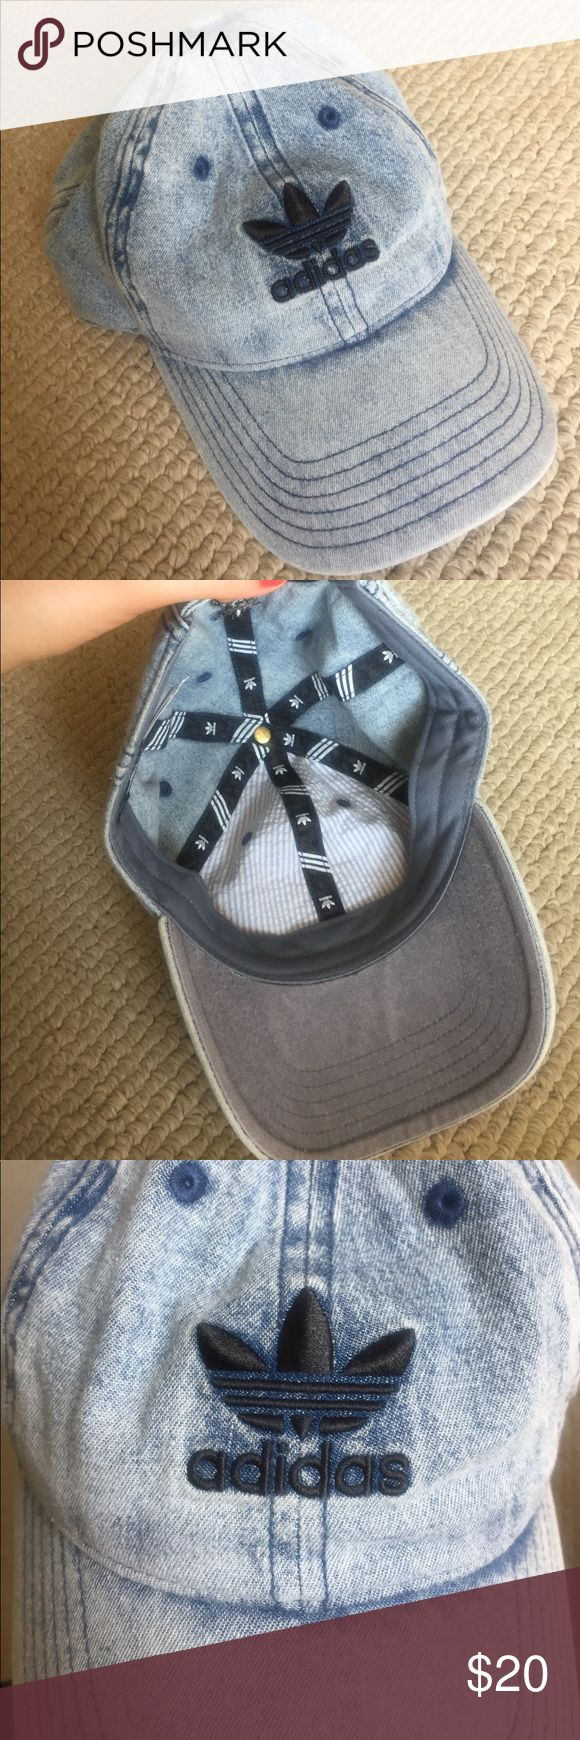 Adidas hat Never worn adidas baseball hat, acid wash/light blue adidas Accessories Hats